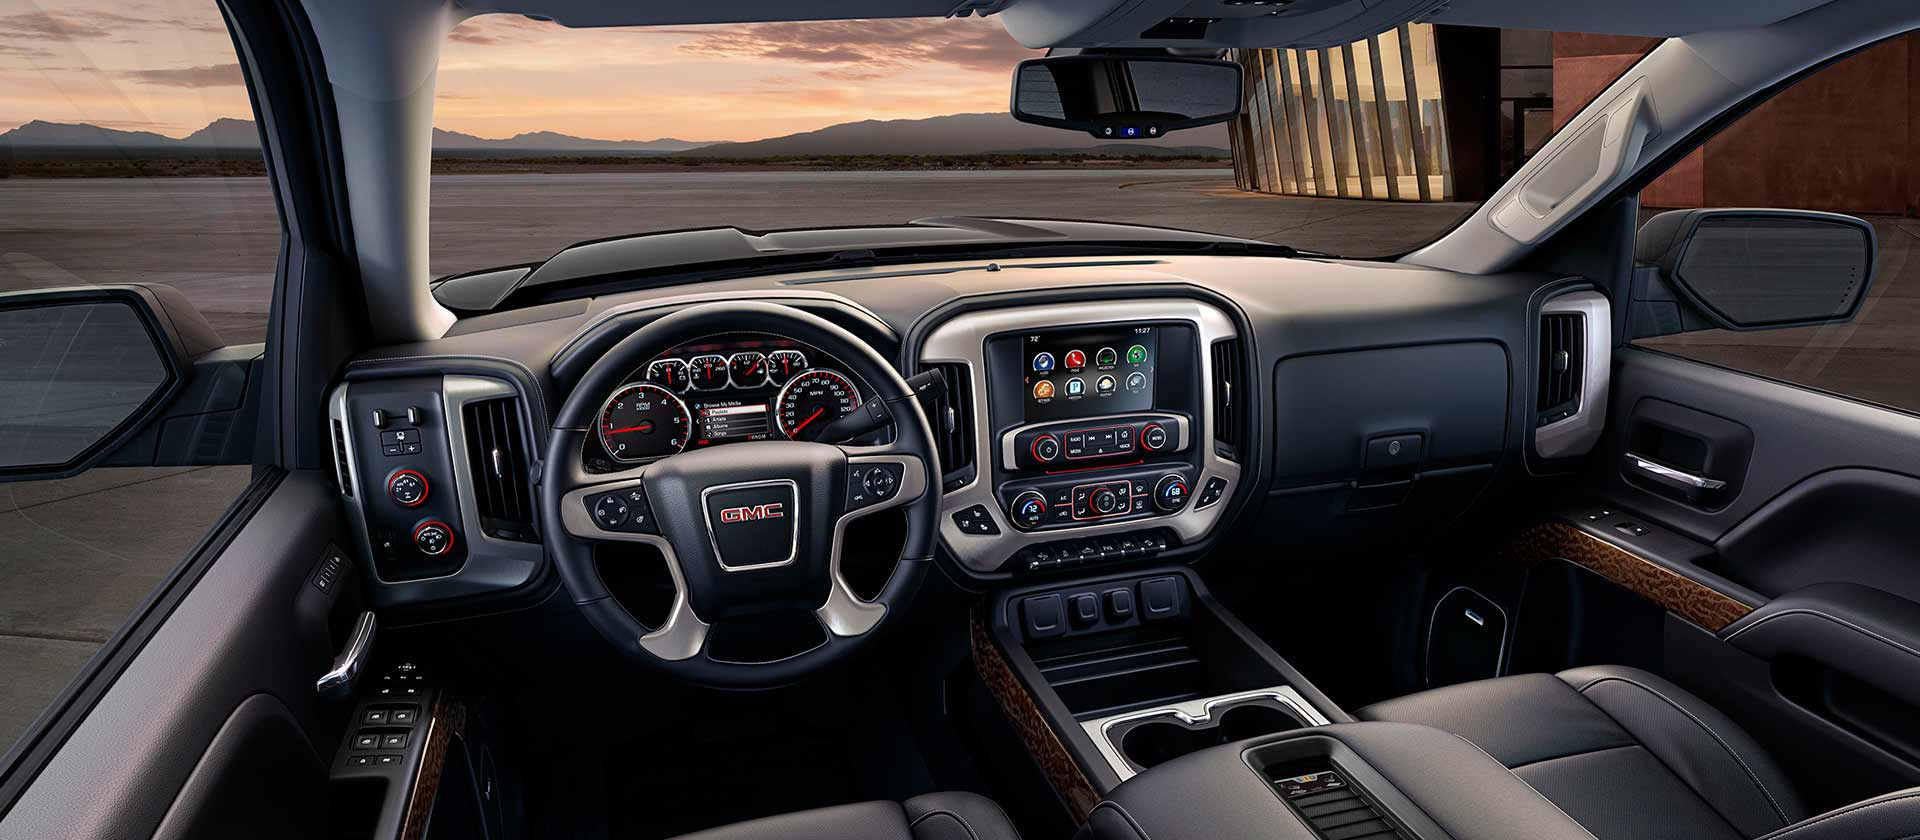 New GMC Sierra 1500 Interior main image